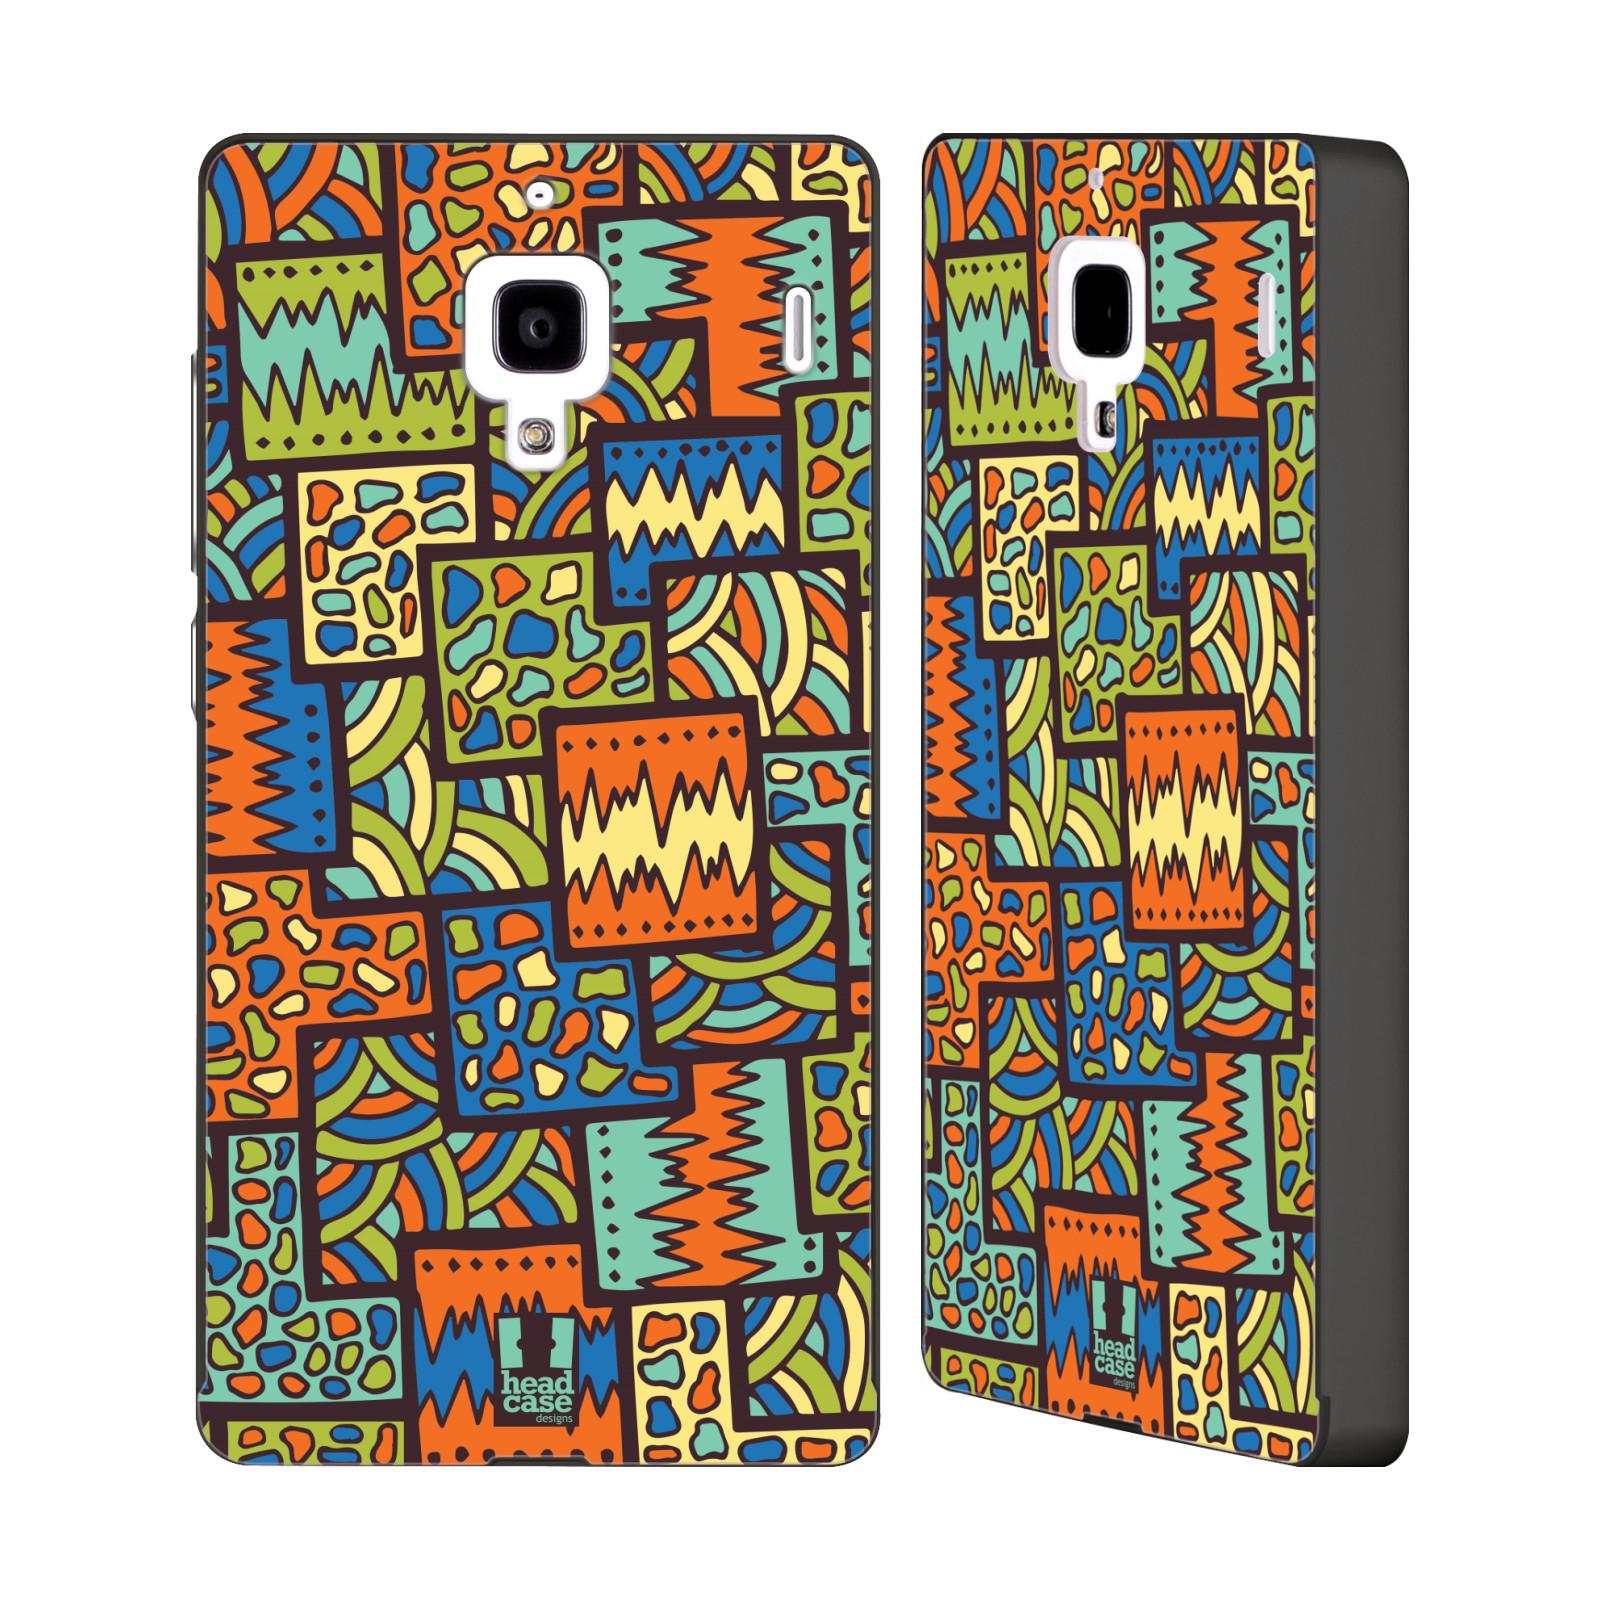 HEAD-CASE-DESIGNS-CHROMATIC-POP-BLACK-SLIDER-CASE-FOR-HUAWEI-XIAOMI-PHONES